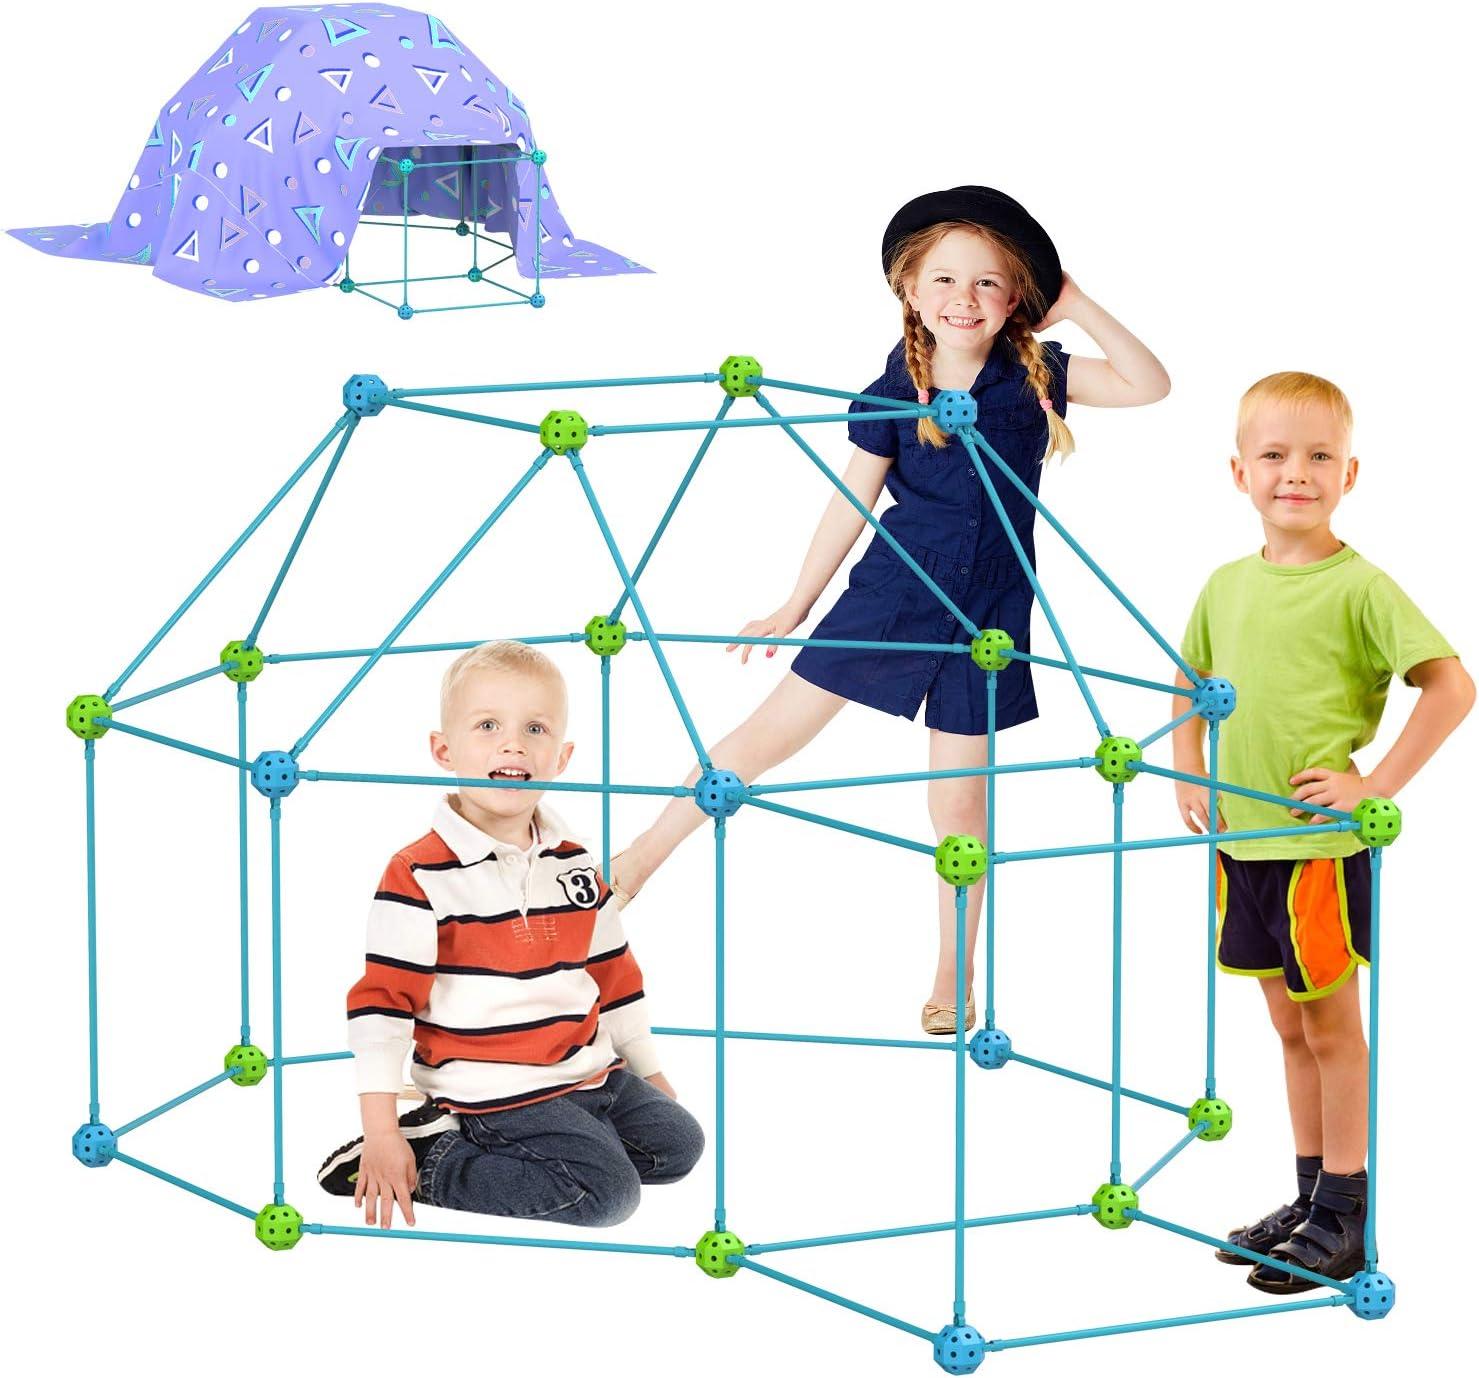 INFUN 120 Pieces Kids Fort Cash special price Excellent Kit Buil Crazy Building Construction